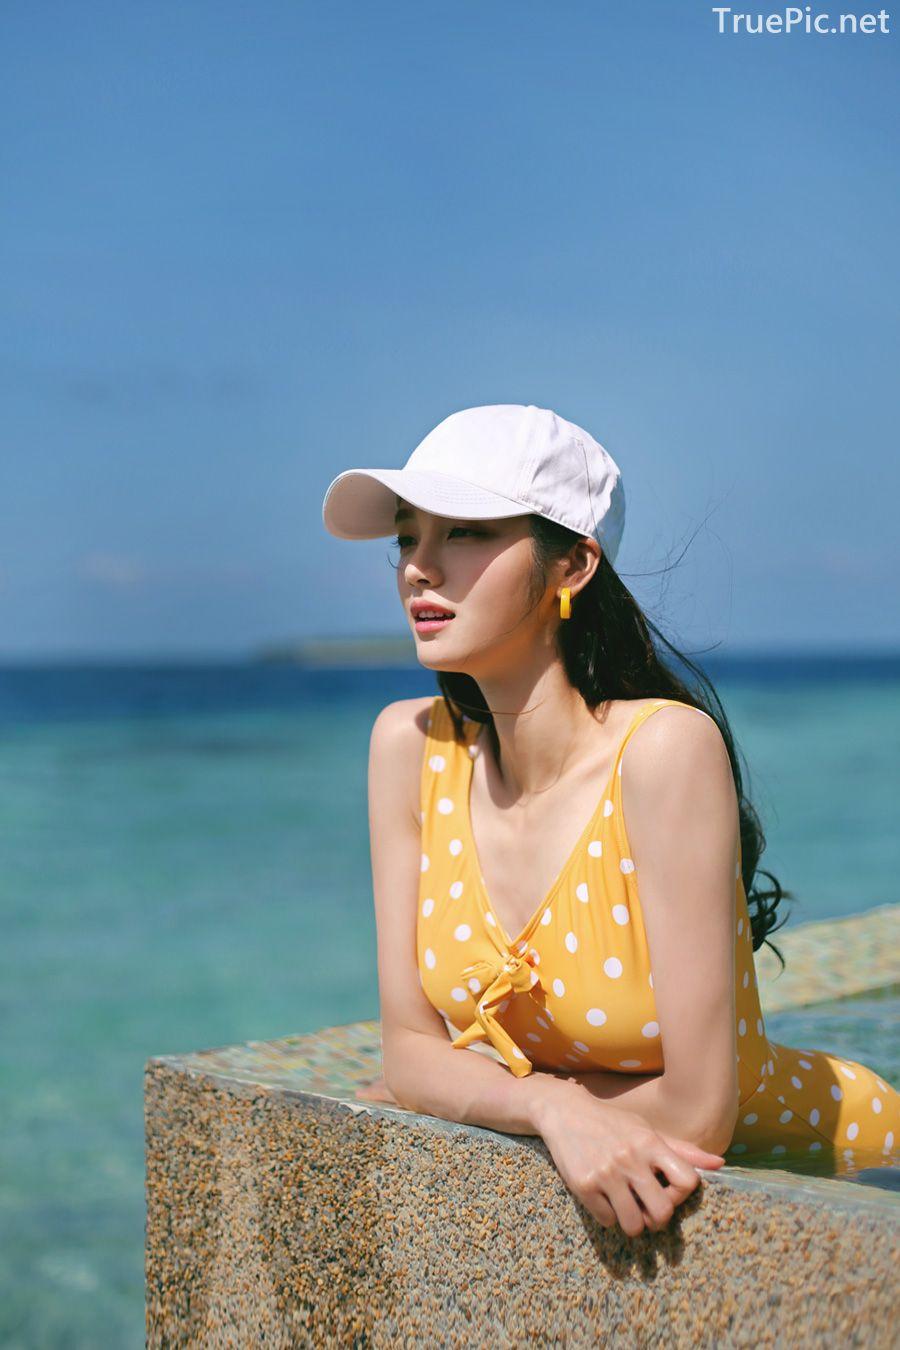 Korean fashion model Jeong Hee - Everyone once a monokini - Picture 5